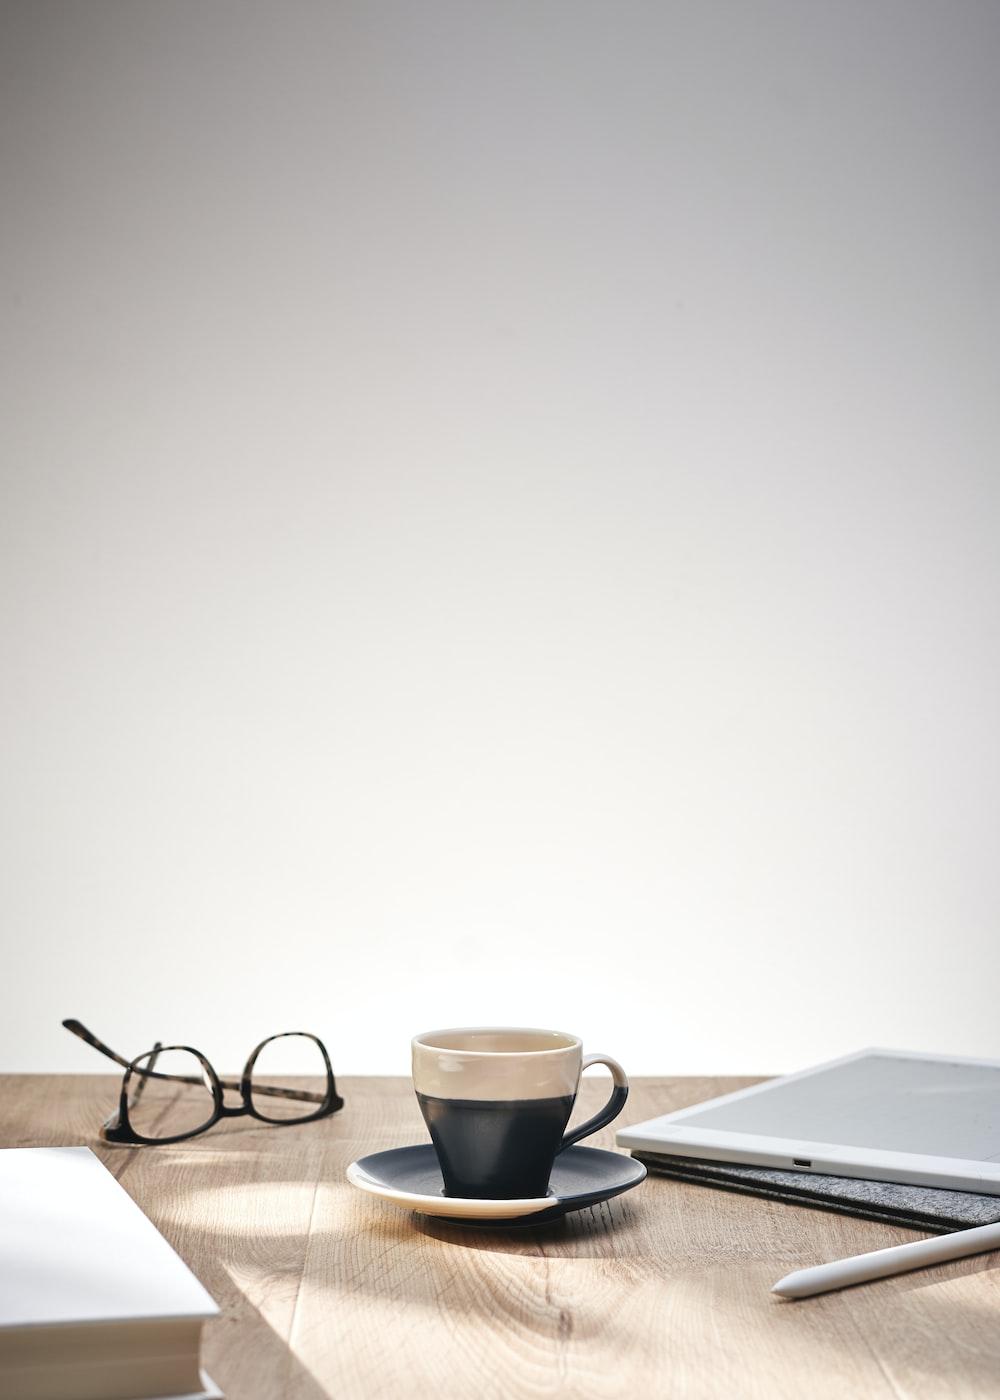 cup on saucer near framed eyeglasses